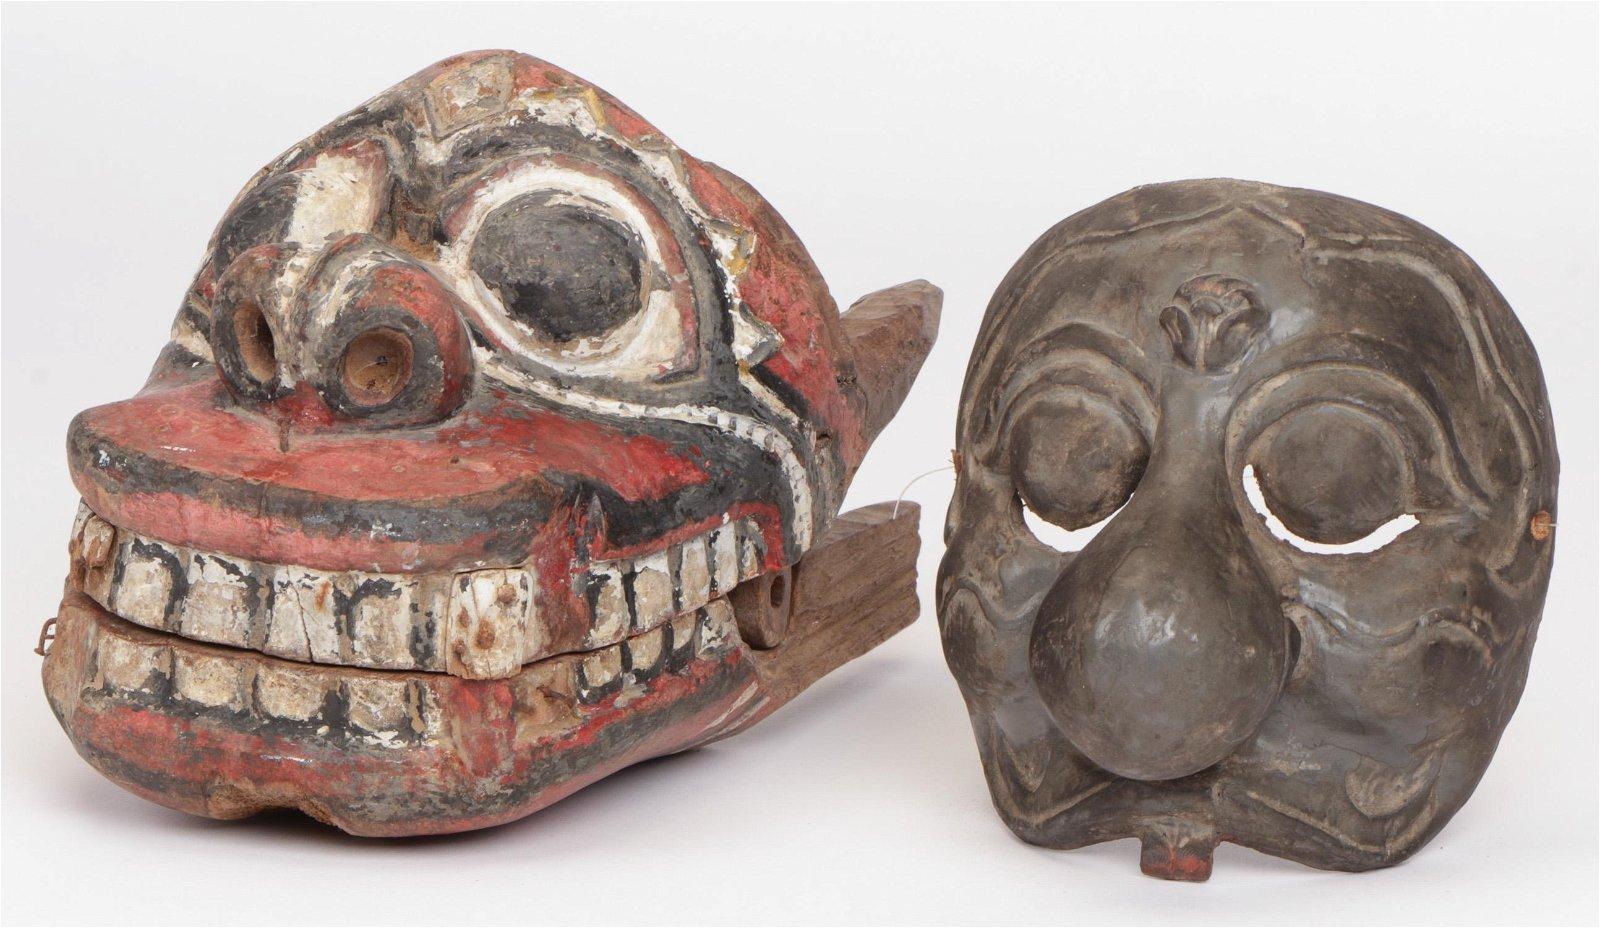 2 Antique Masks, Bali and Java